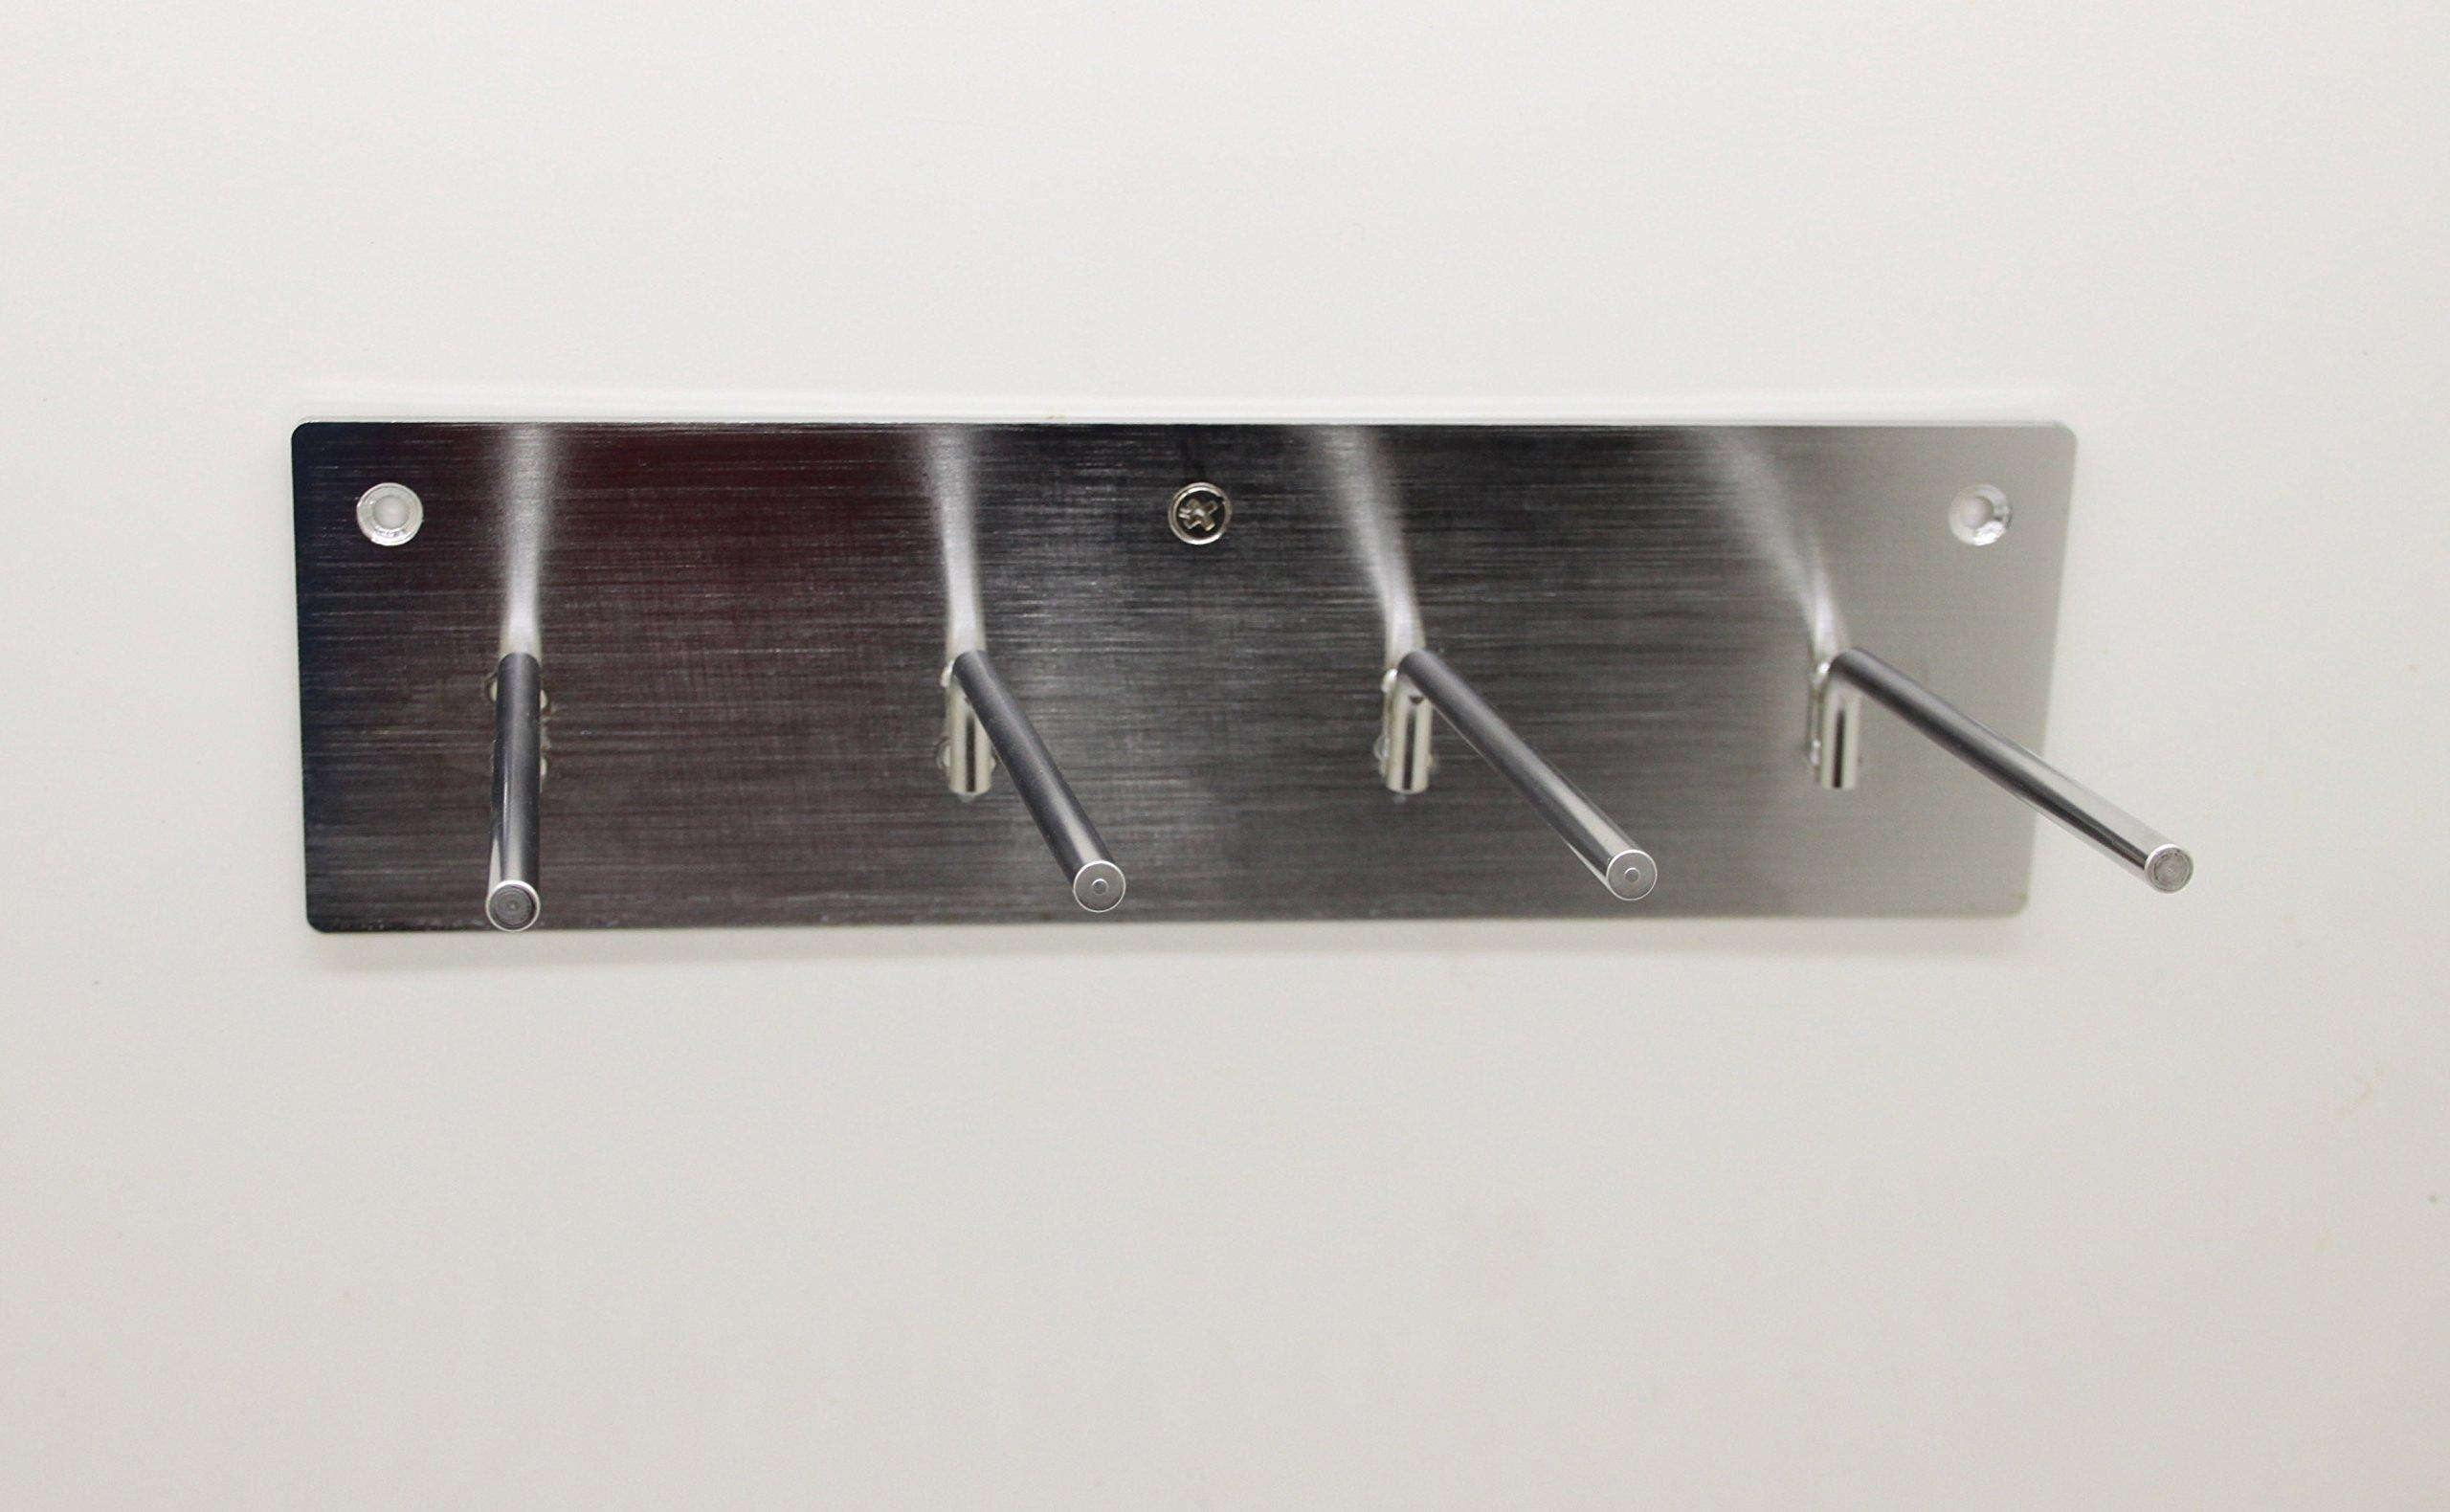 FixtureDisplays Set of 3 4-PEG Lead Apron Wall-Mount Hook Hanger 15686